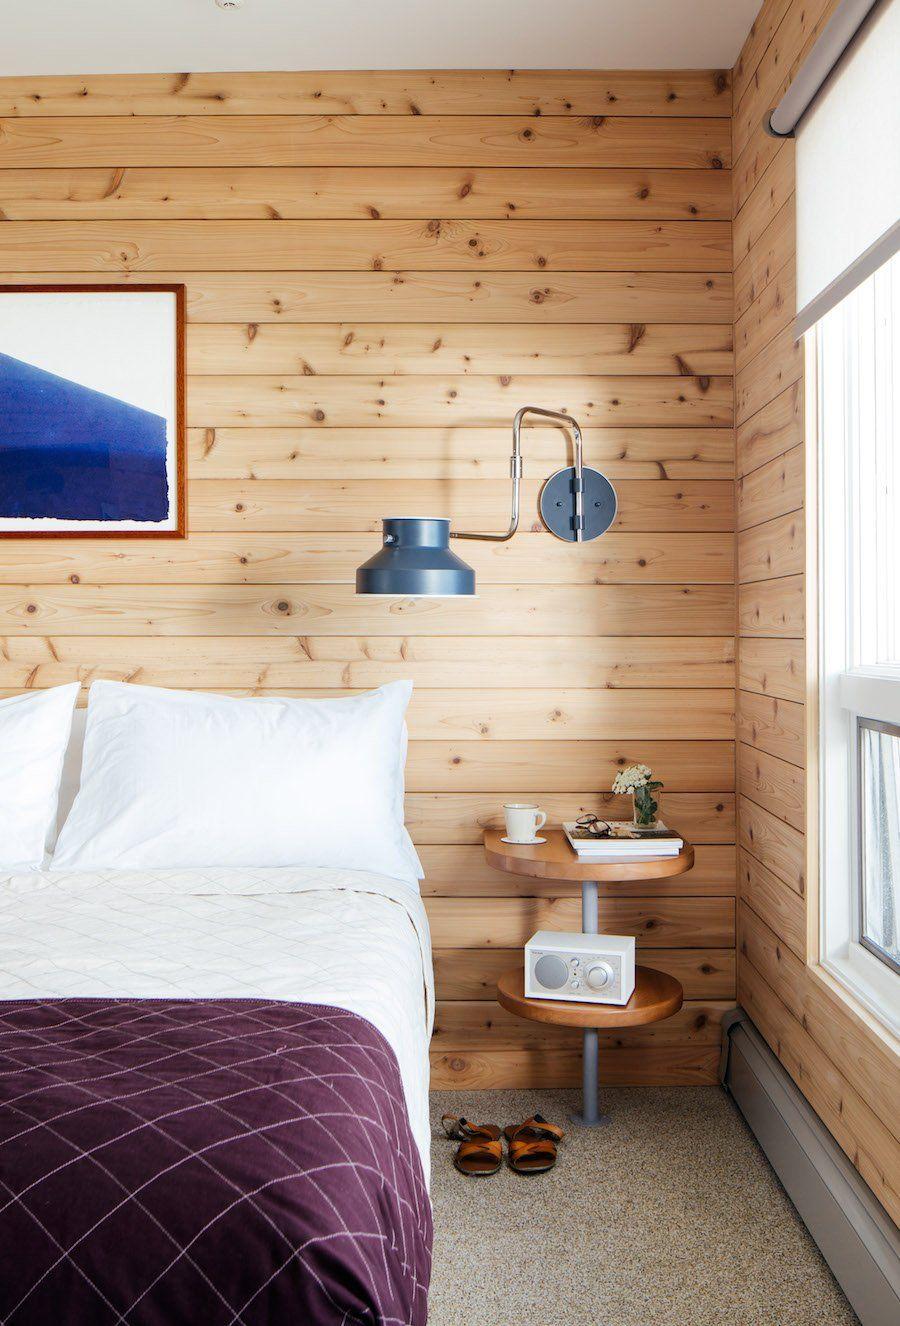 Motel Room Interiors: Sound View: A Fifties-Era Motel Made Modern In Greenport